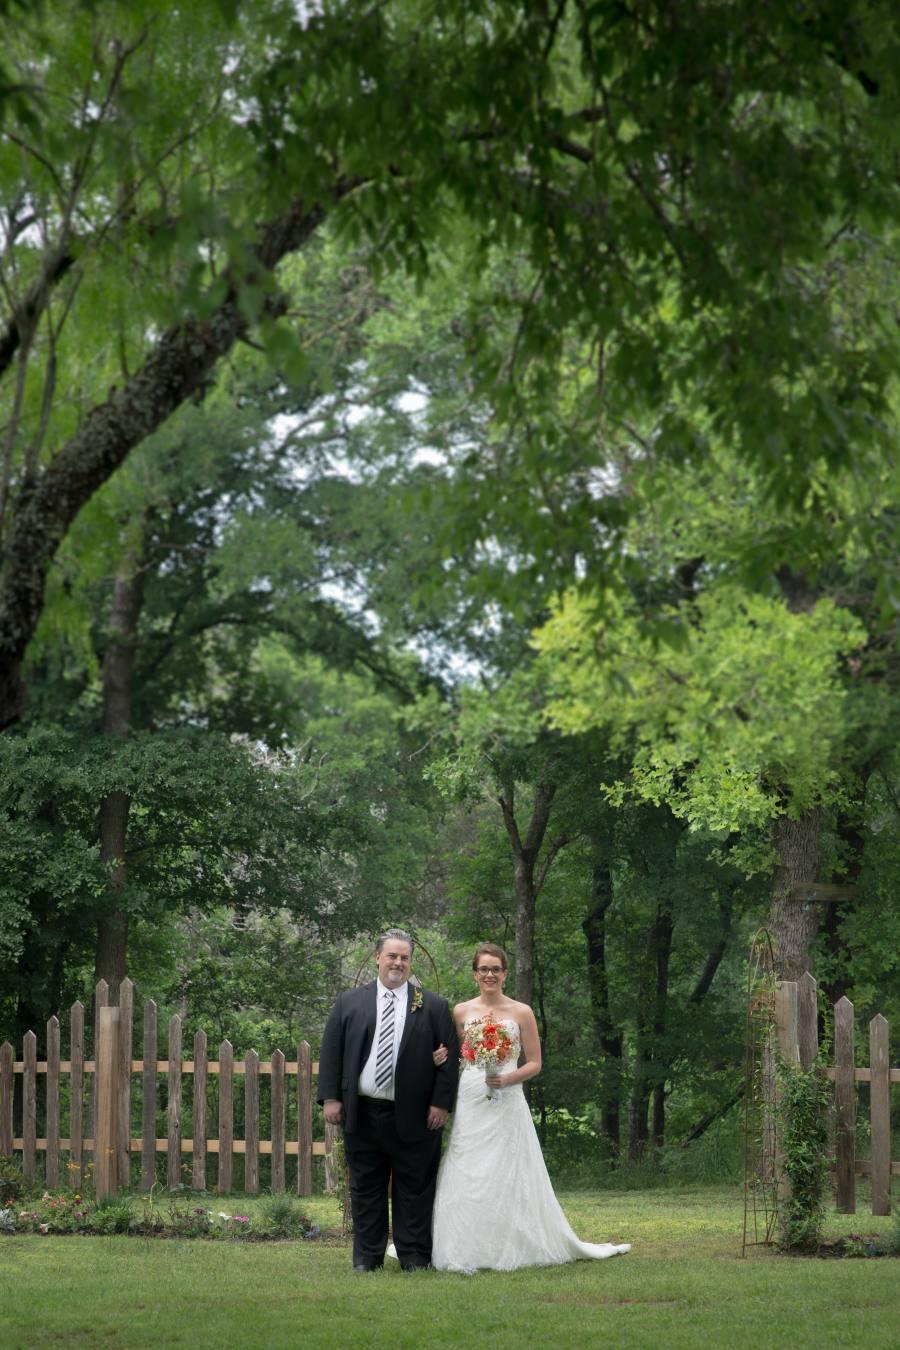 HighDot-Studios-Wedding-Cedar-Bend-Event-Center -Austin-Kim and Mike (22)